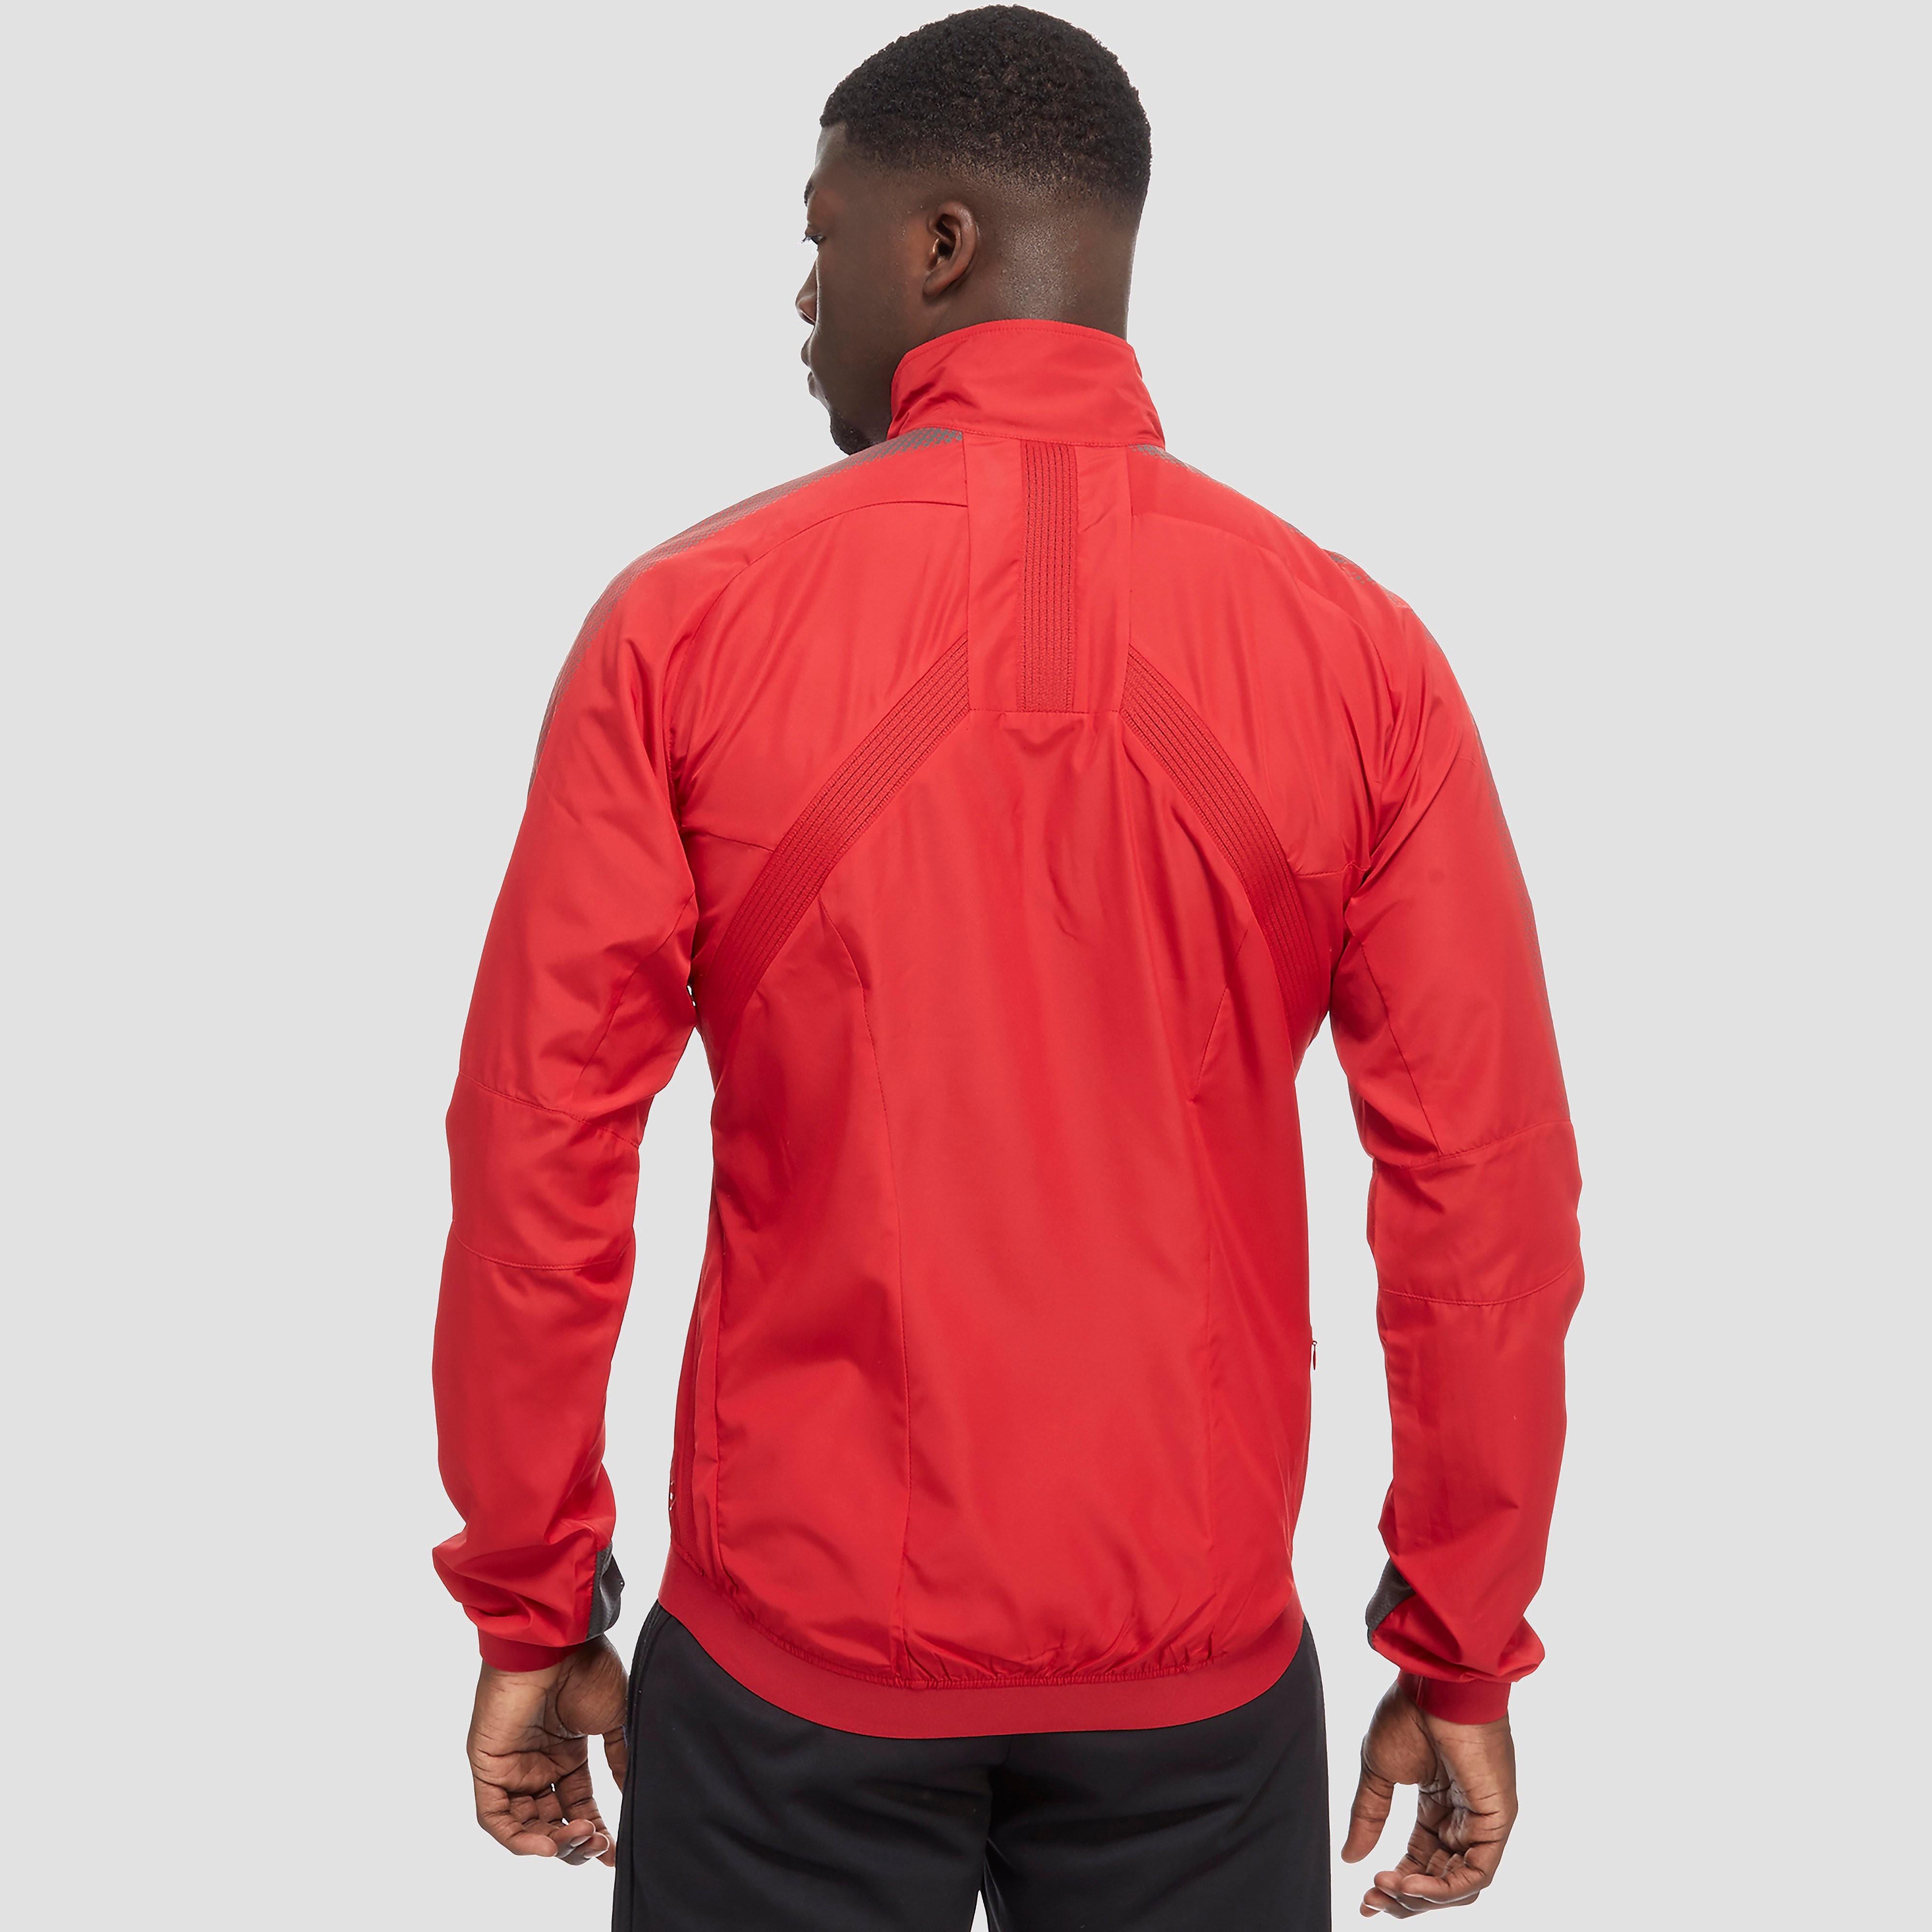 PUMA Arsenal FC 2017 Stadium Men's Ventilation Jacket